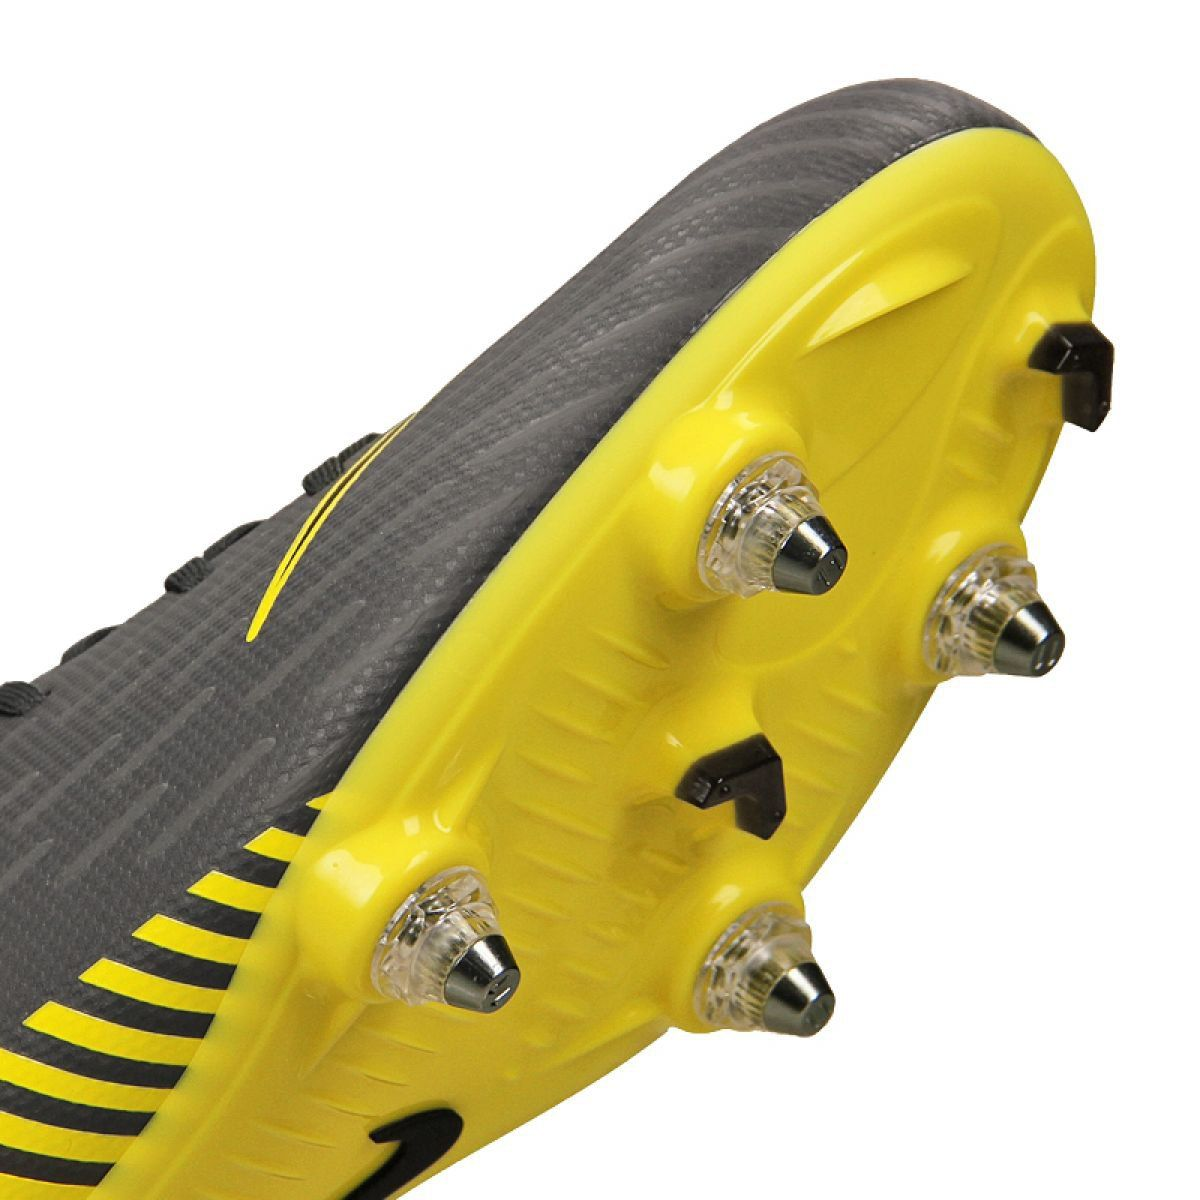 Buty Pilkarskie Nike Mercurial Vapor 12 Academy Sg Pro Fg M Ah7376 070 Czarne Wielokolorowe Football Shoes Black Shoes Sport Shoes